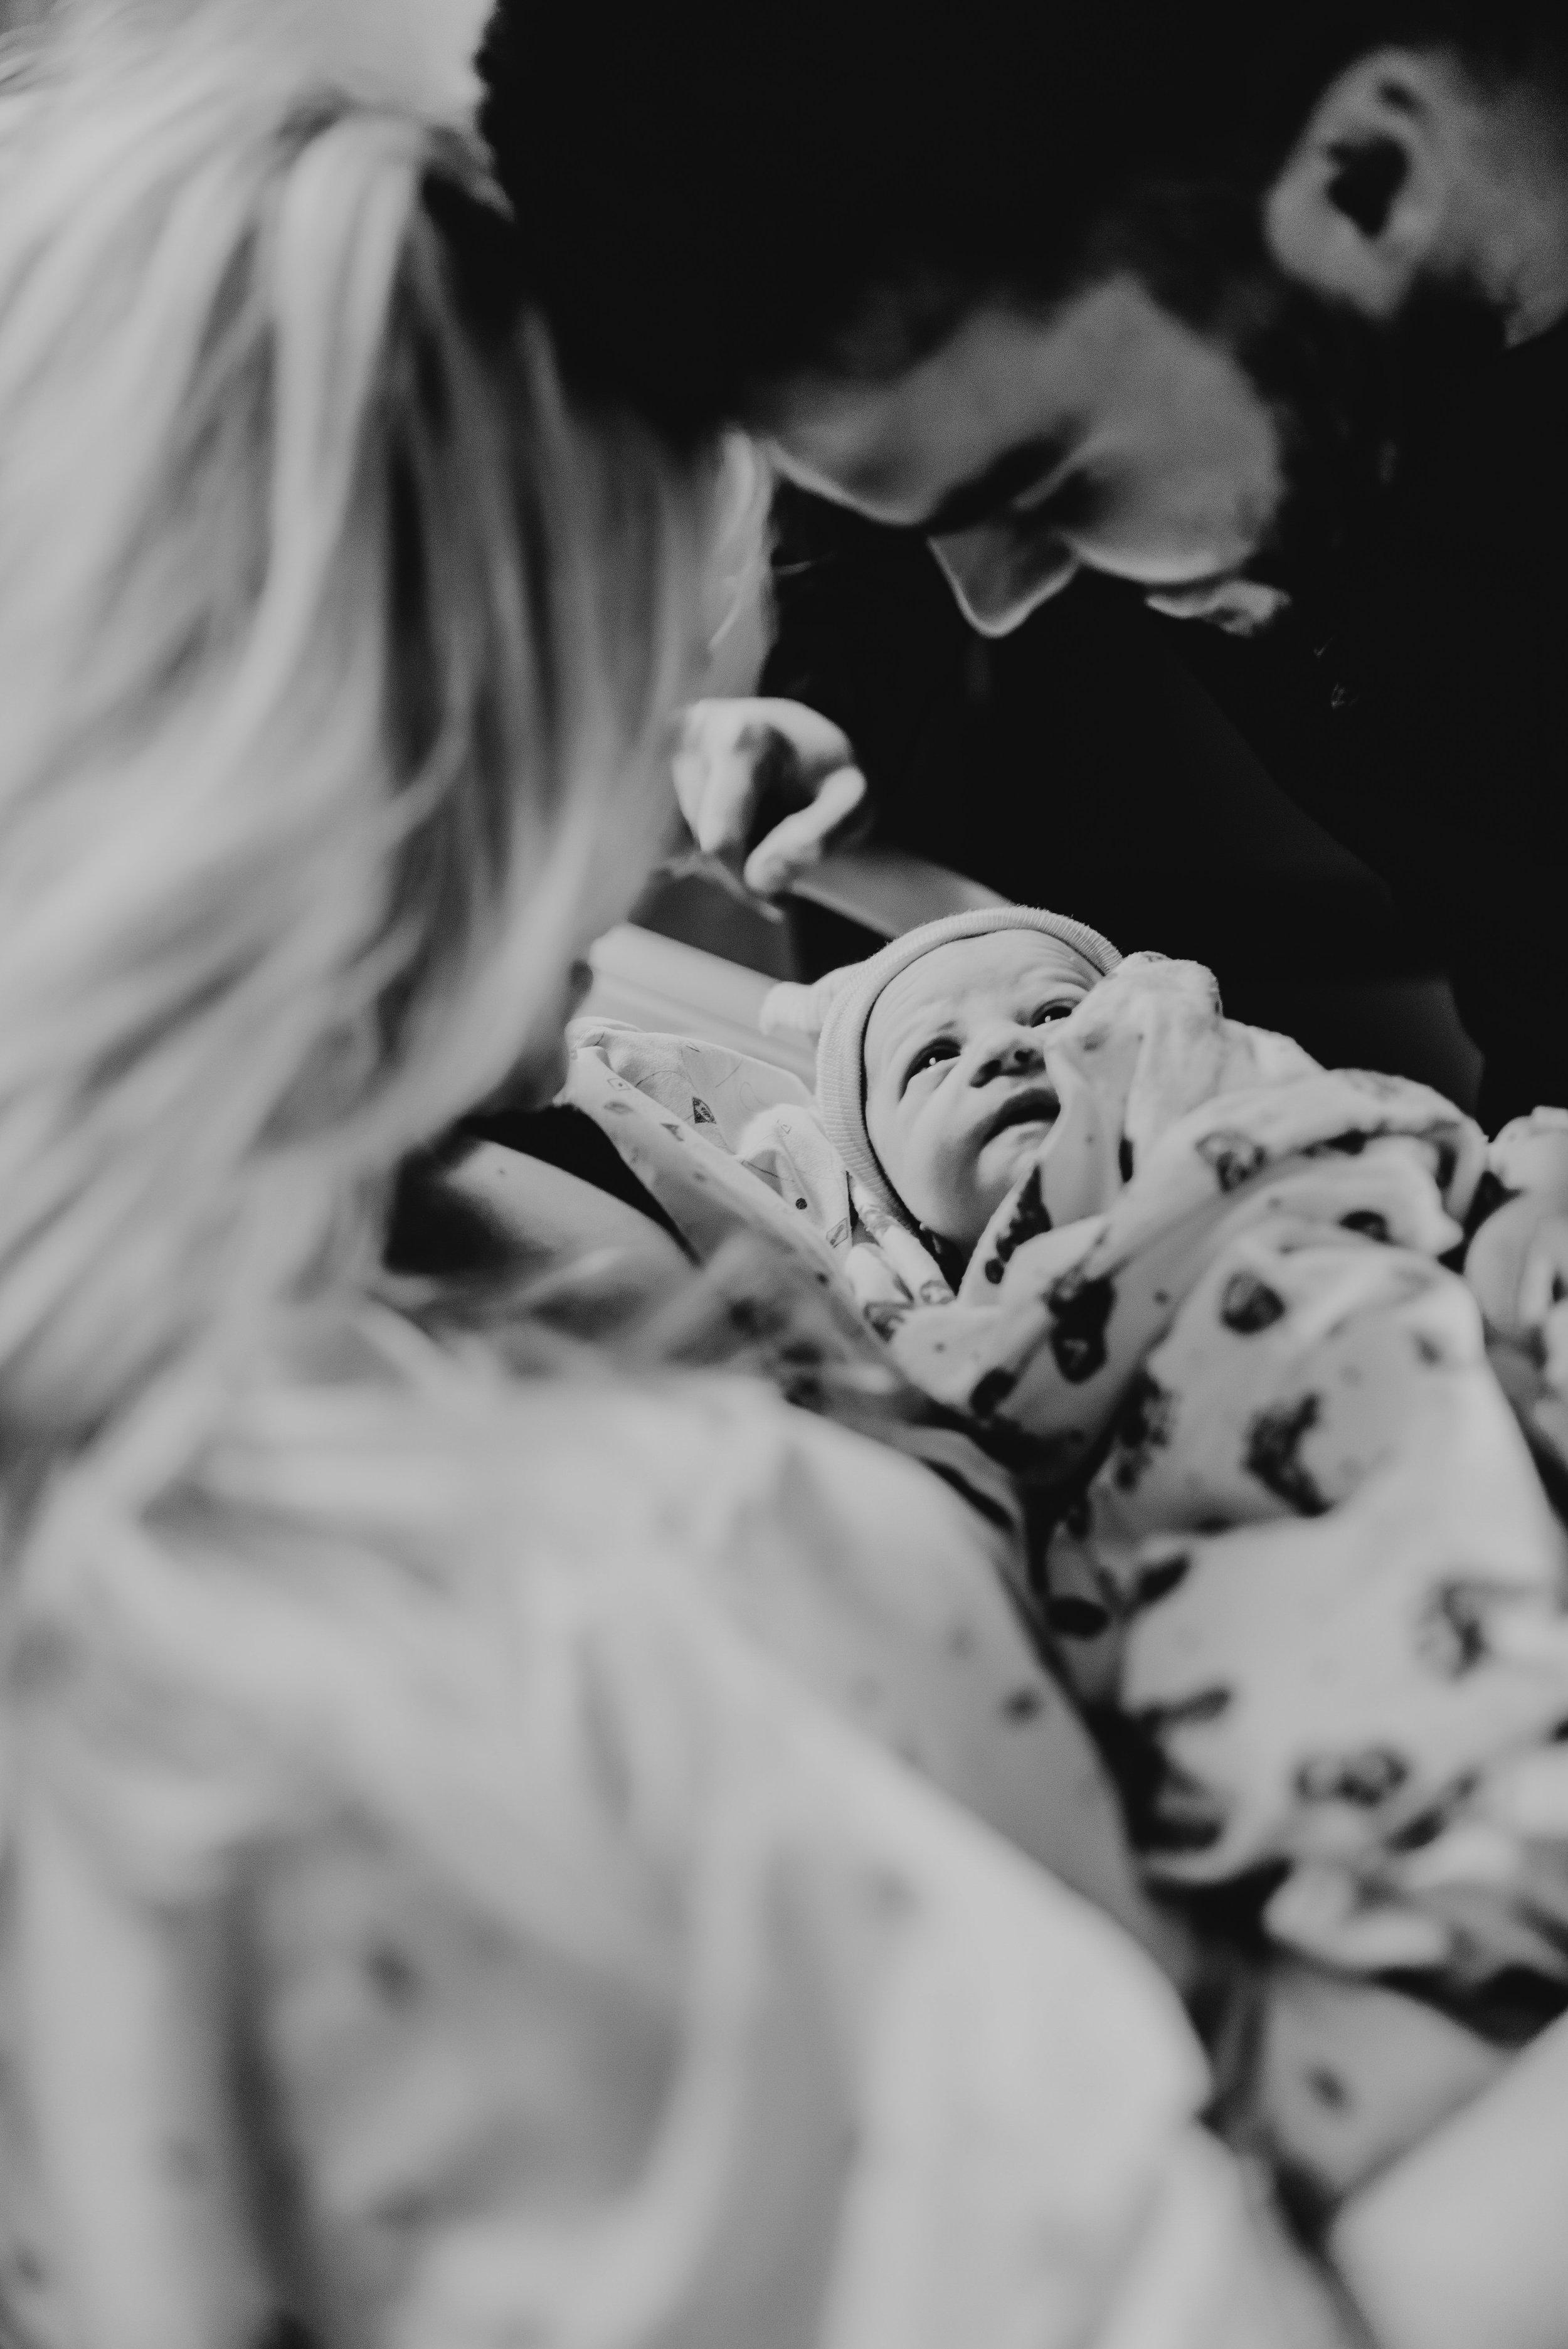 ELLIOT_birth-7309-2.jpg